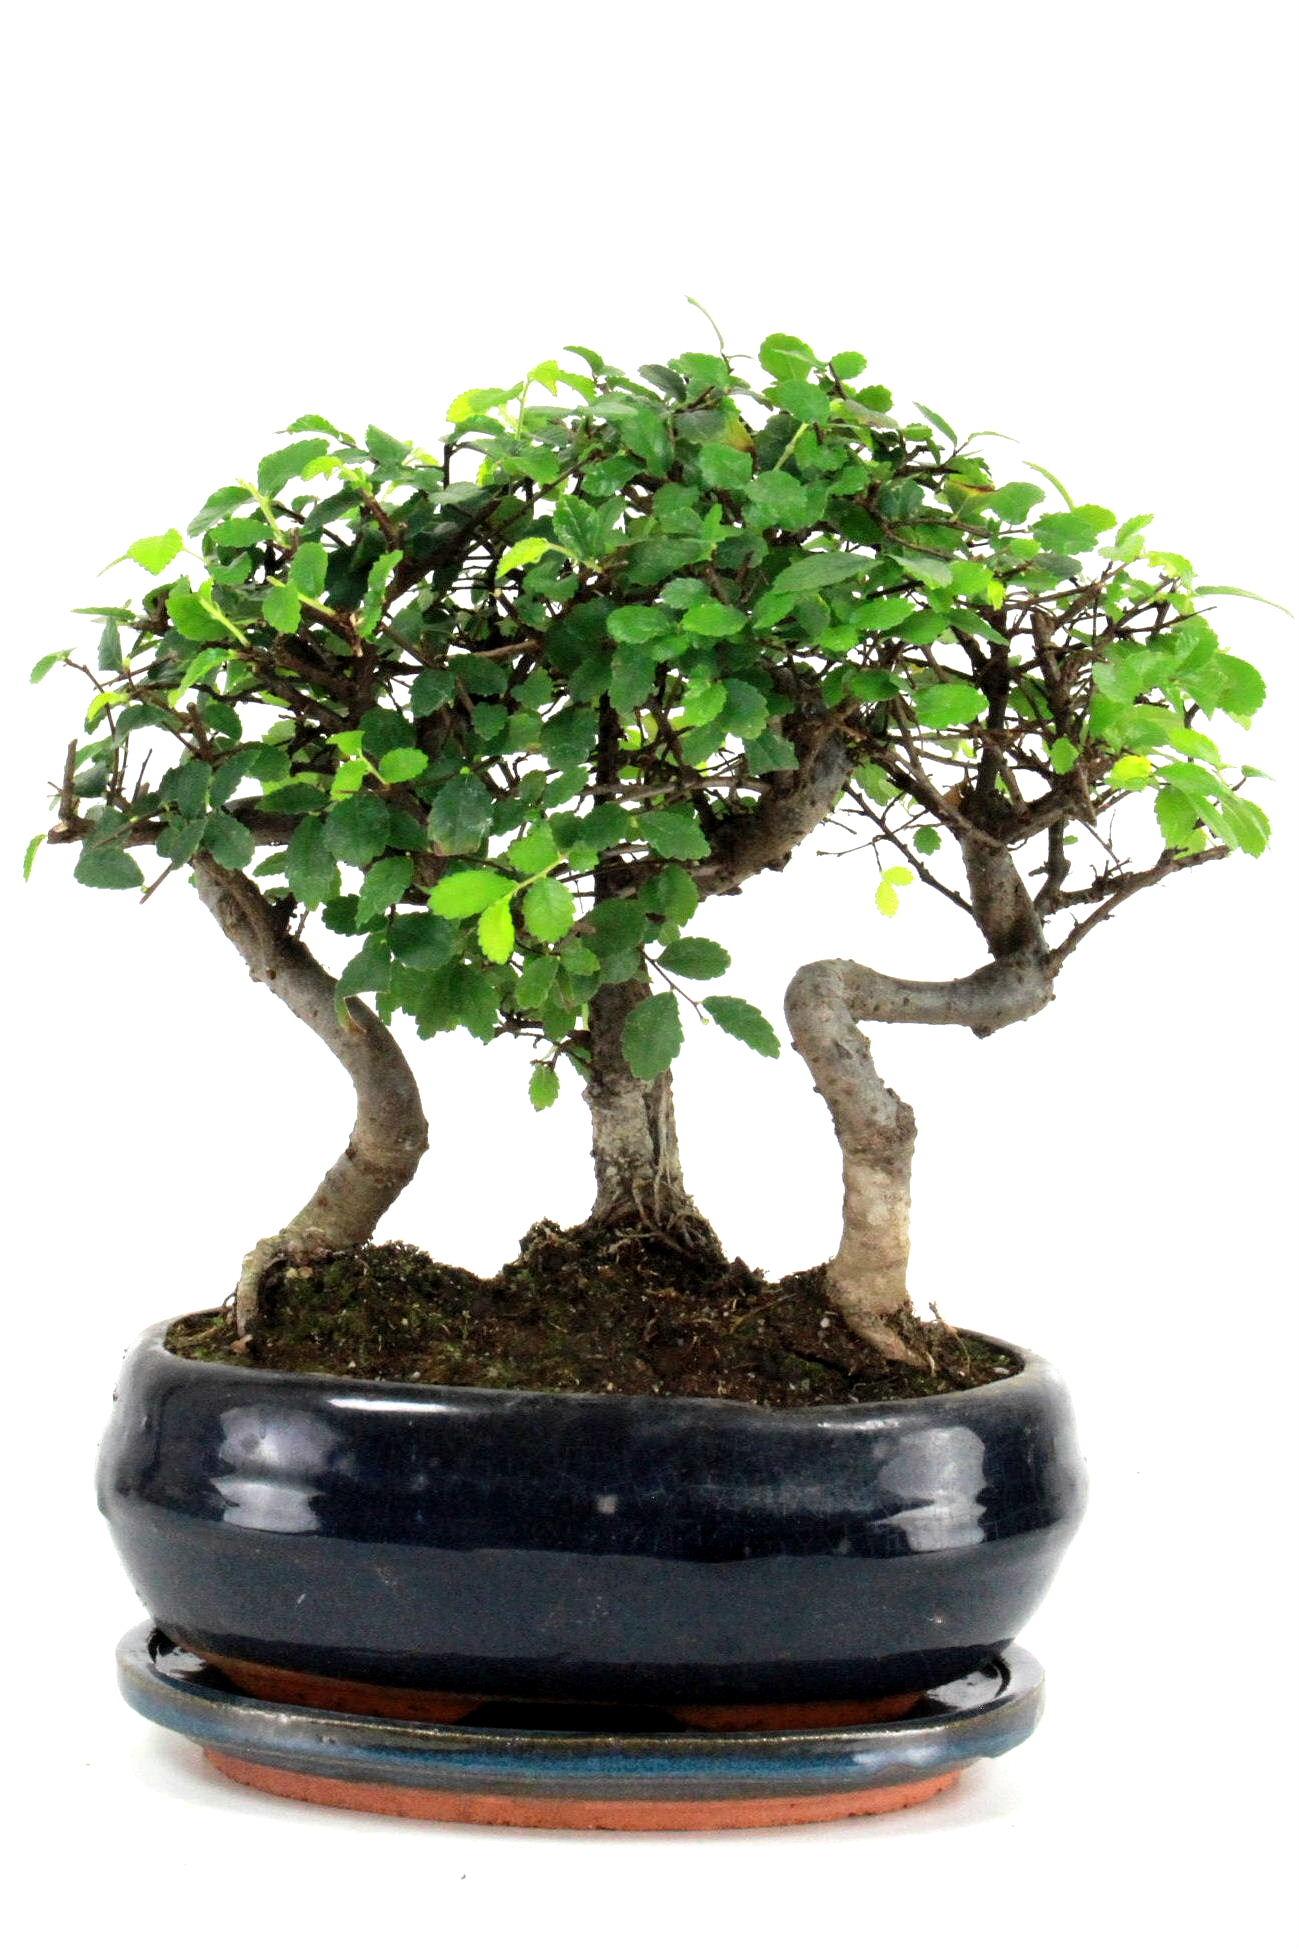 bonsai chinesische ulme gruppenpflanzung 30 cm 195 bei oyaki bonsai kaufen. Black Bedroom Furniture Sets. Home Design Ideas